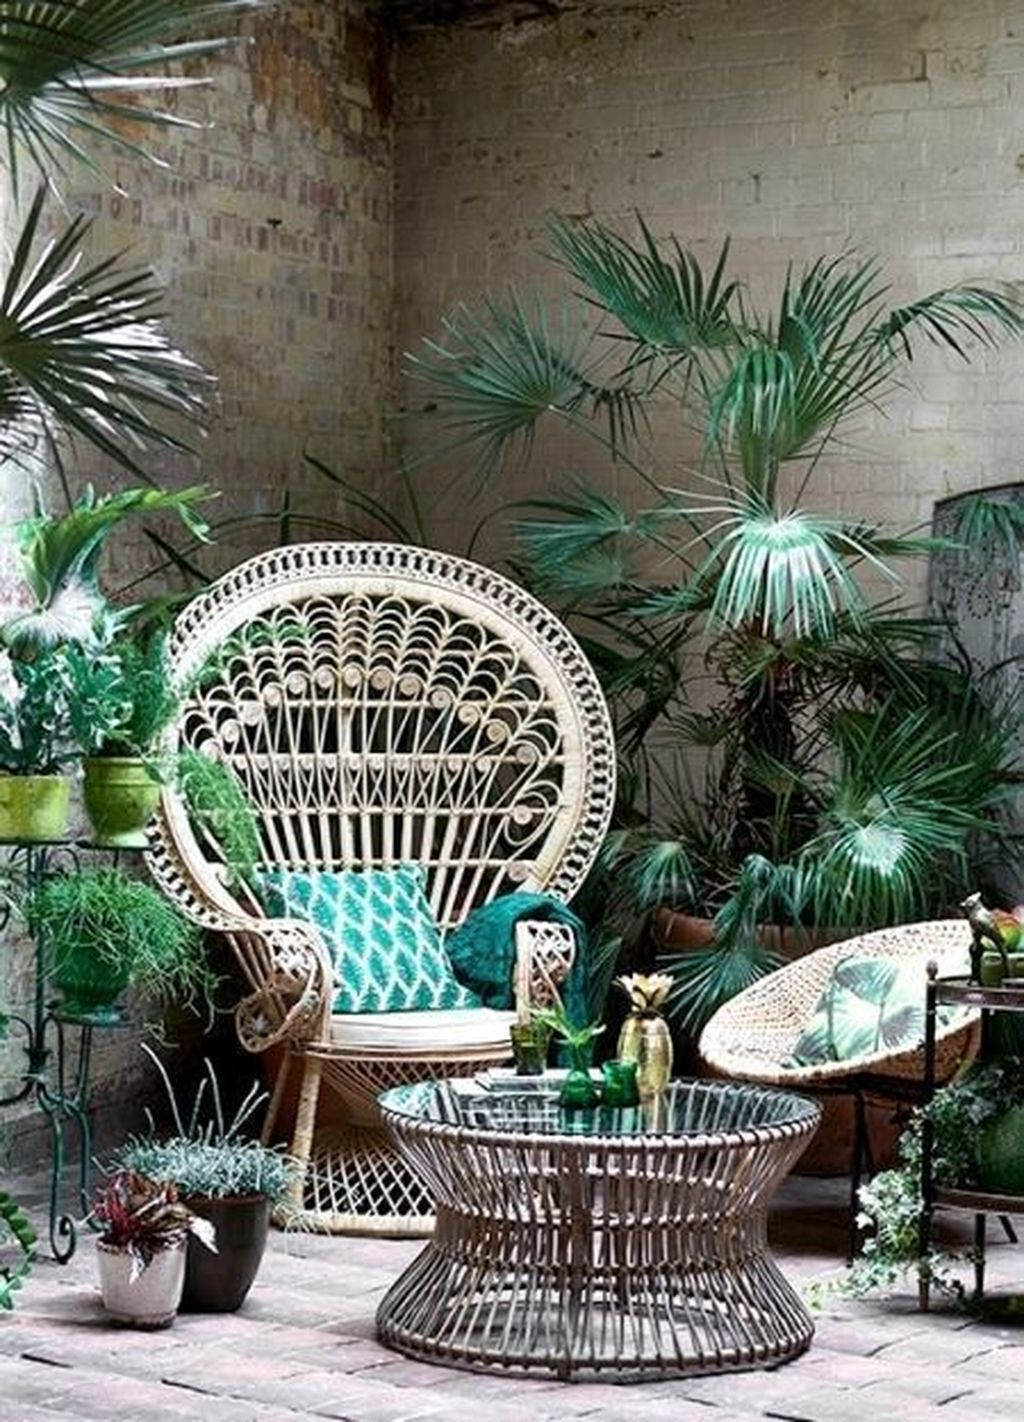 Best Minimalist Furniture Design Ideas For Your Outdoor Area 15